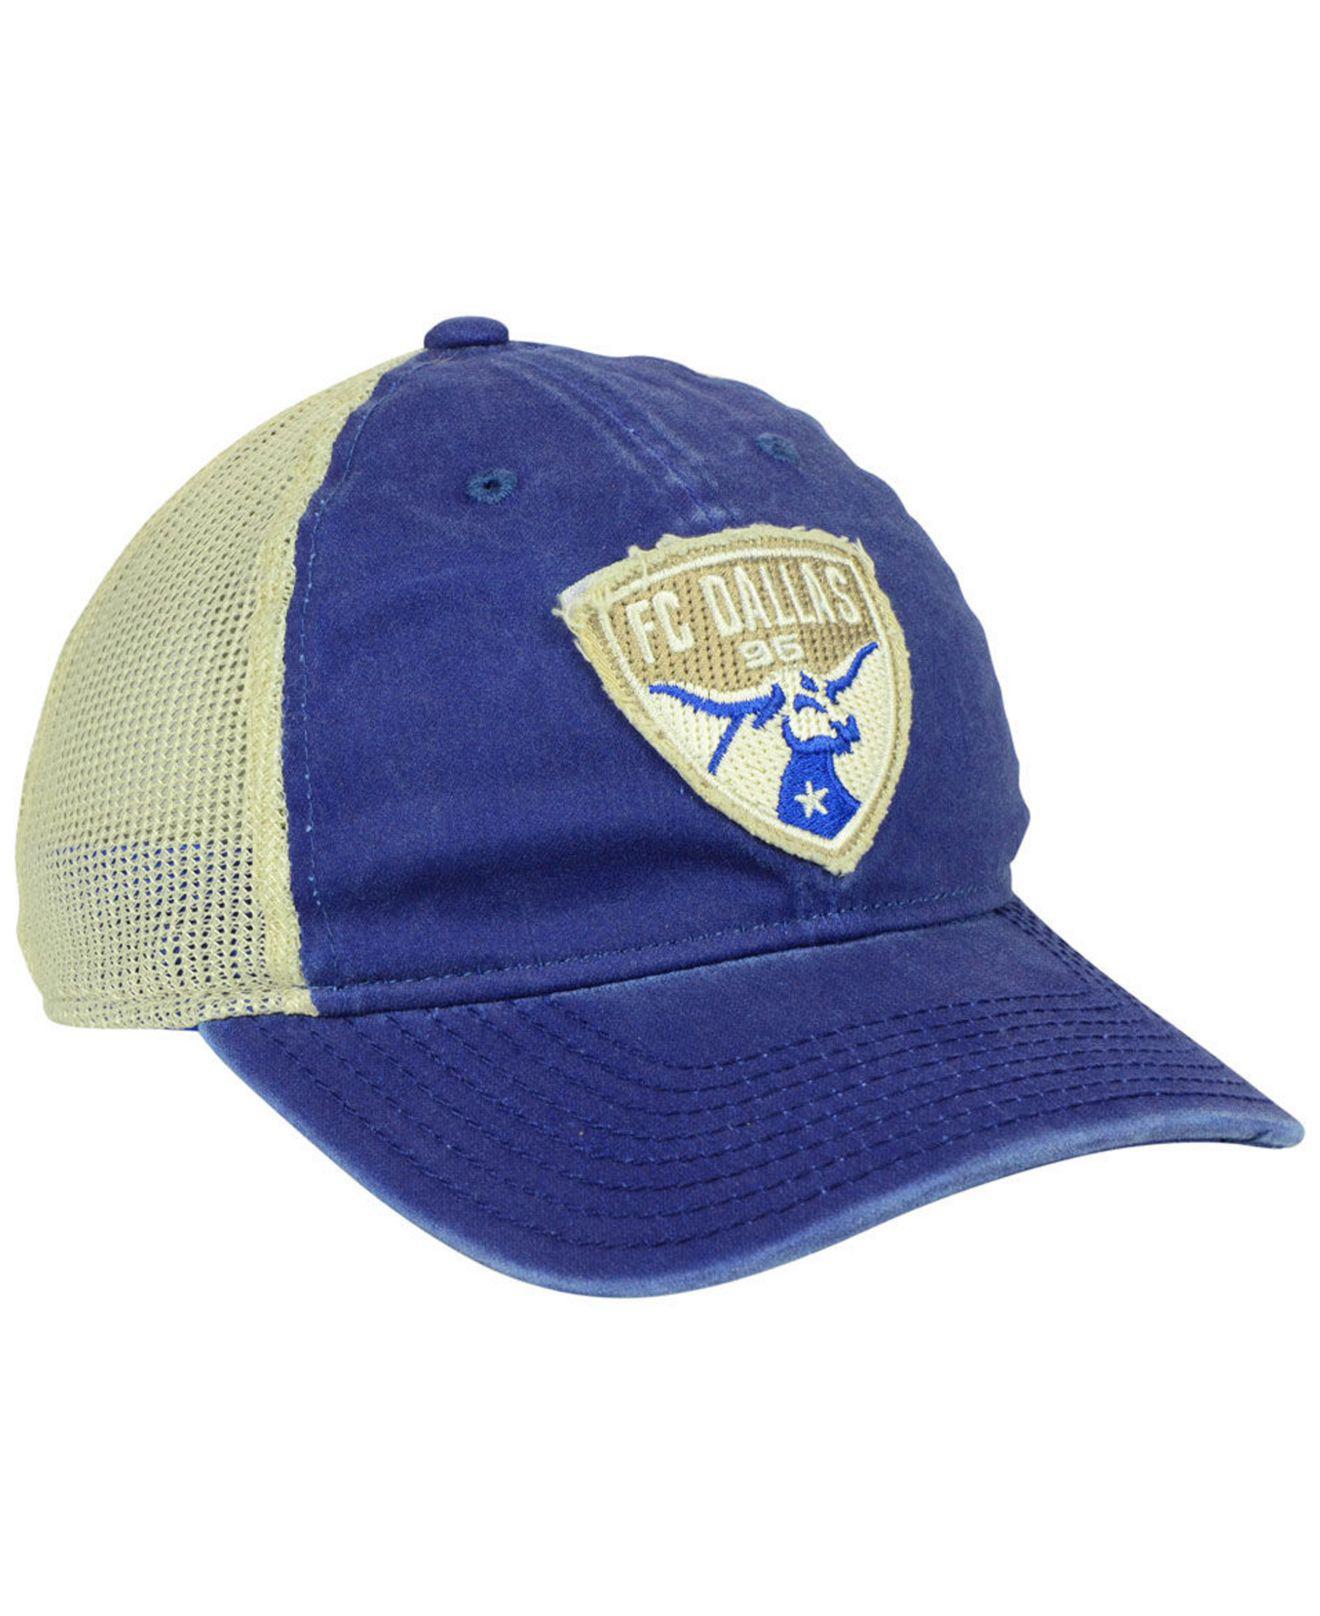 the best attitude 806b5 c8a95 ... get adidas blue fc dallas bleached trucker cap lyst. view fullscreen  79ed6 a7a1d